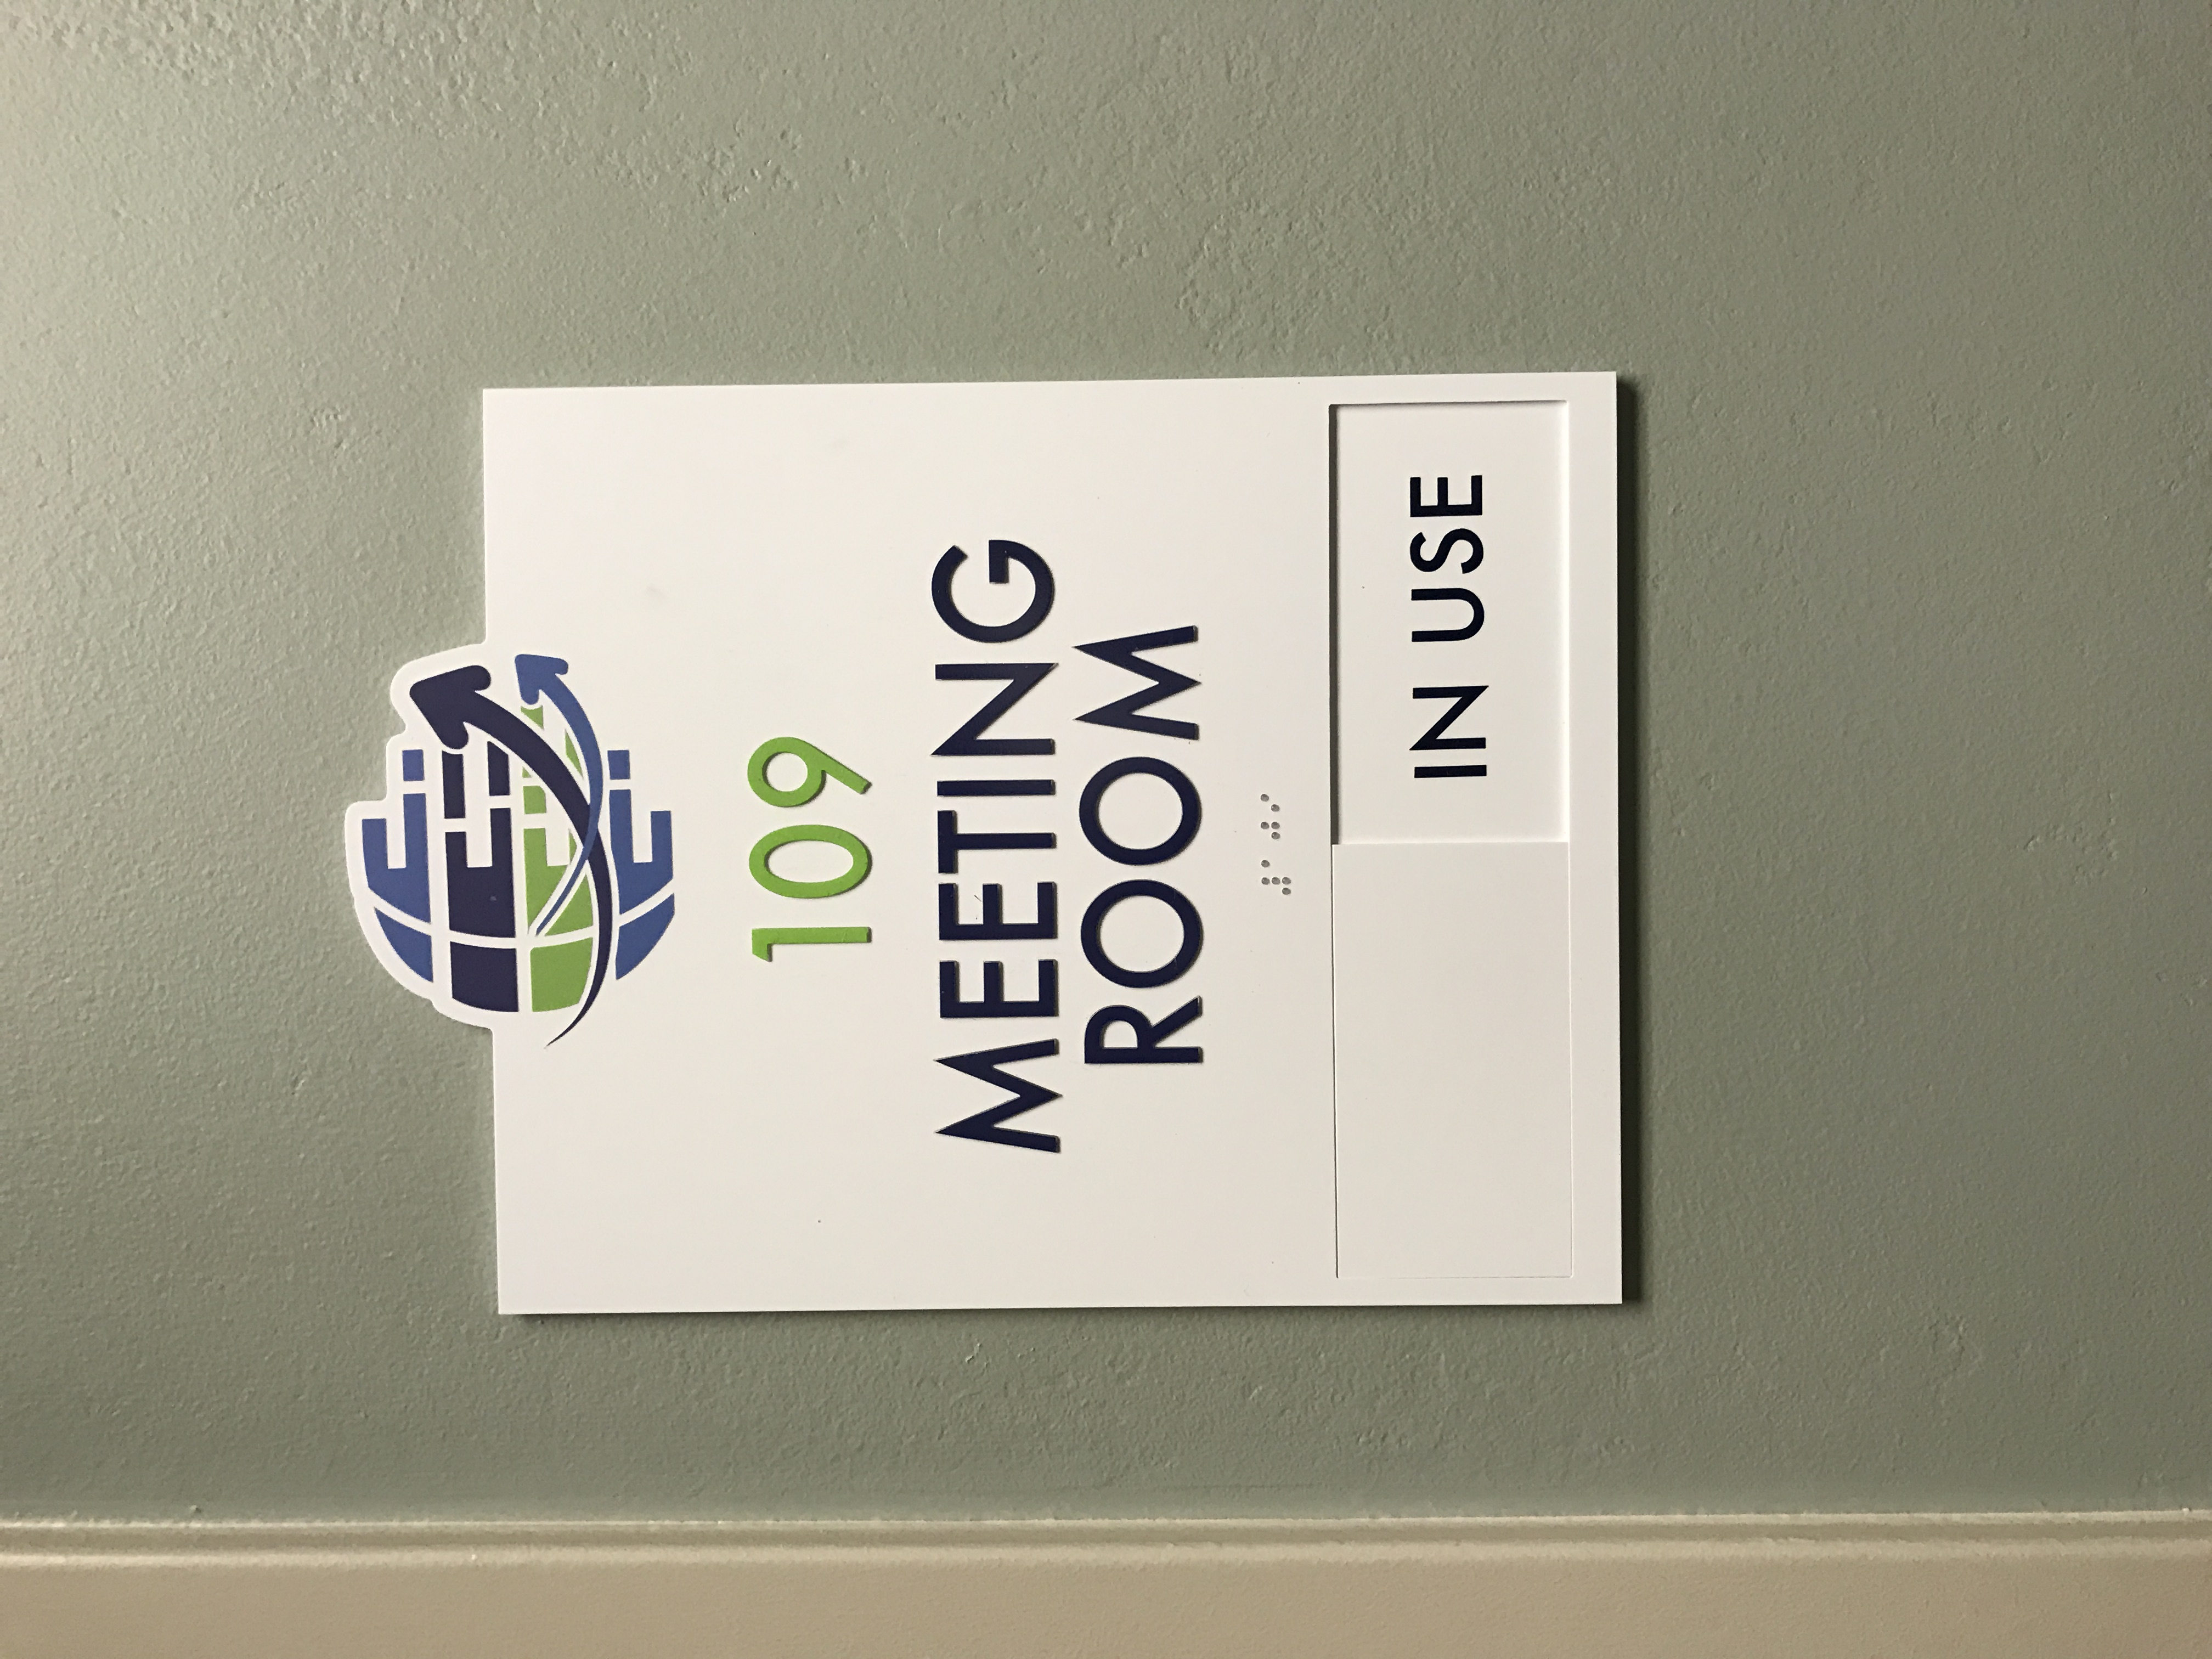 ADA Meeting Room Sign